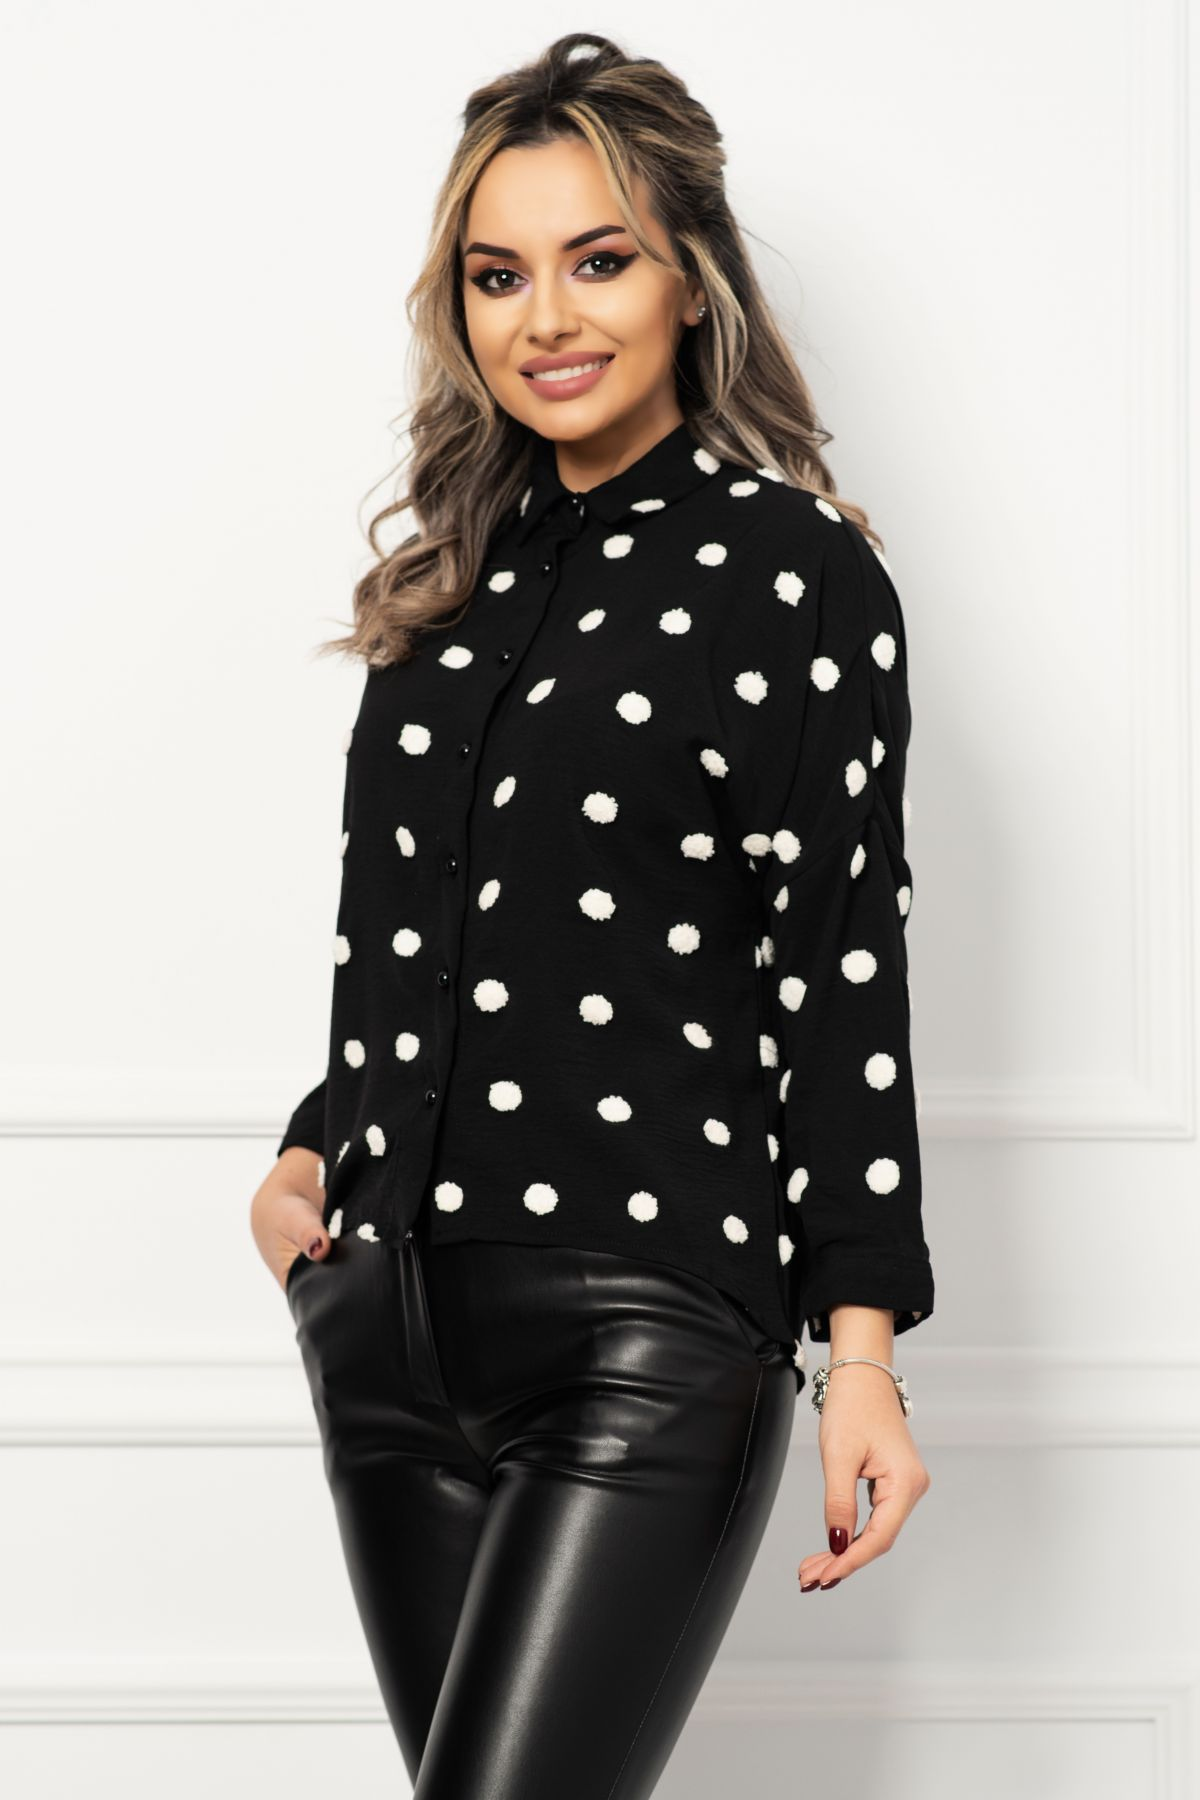 Camasa trendy neagra cu plumeti albi in contrast